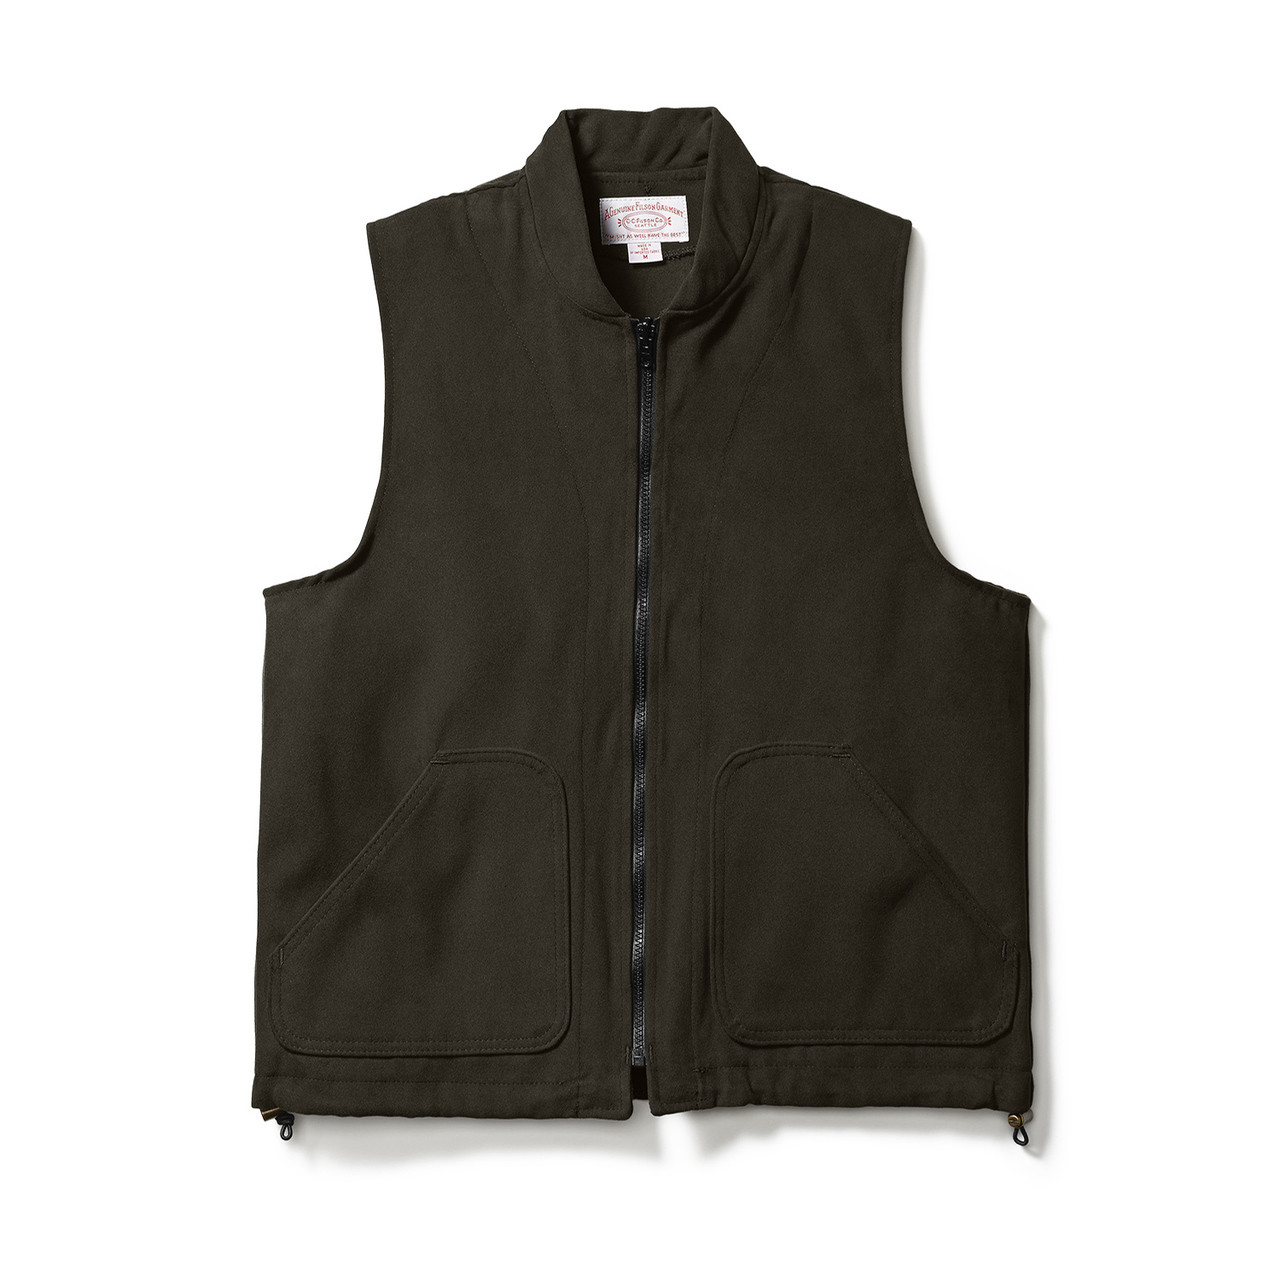 624add7fd057 Filson Moleskin Vest Liner - Brown - Craig Reagin Clothiers